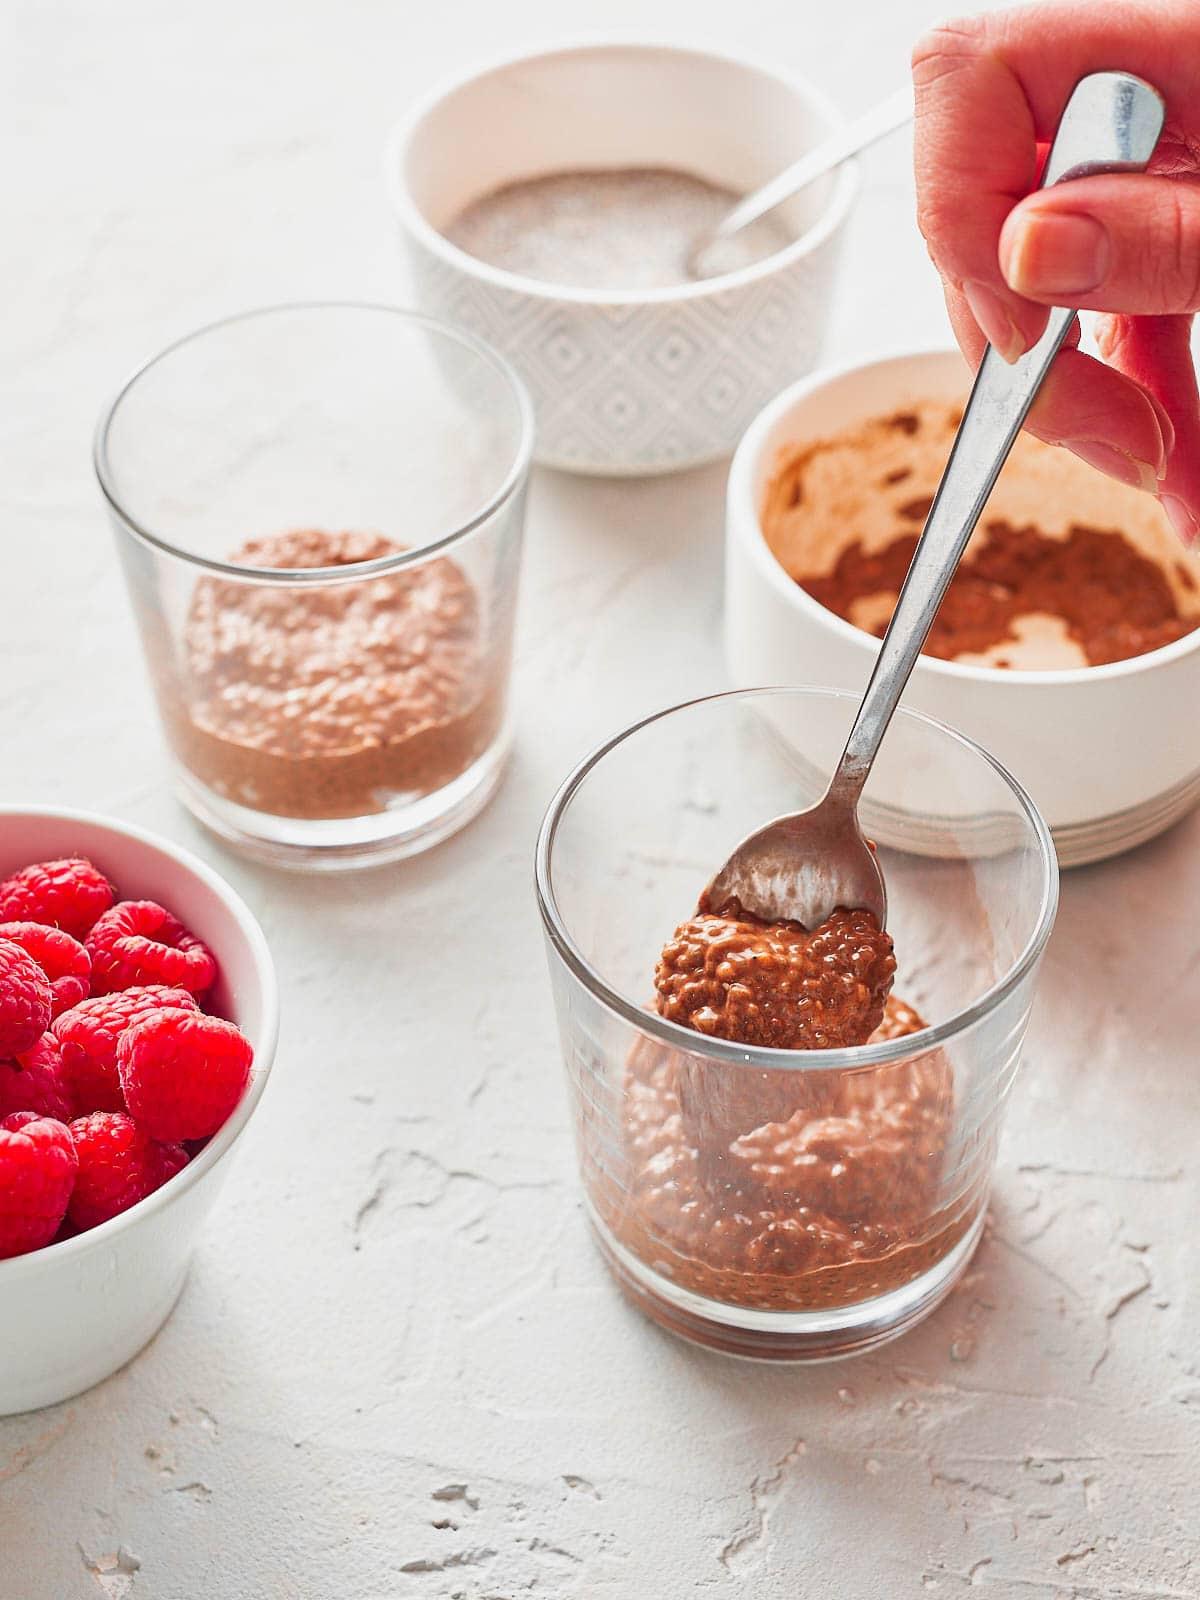 Adding chocolate chia pudding to the glass